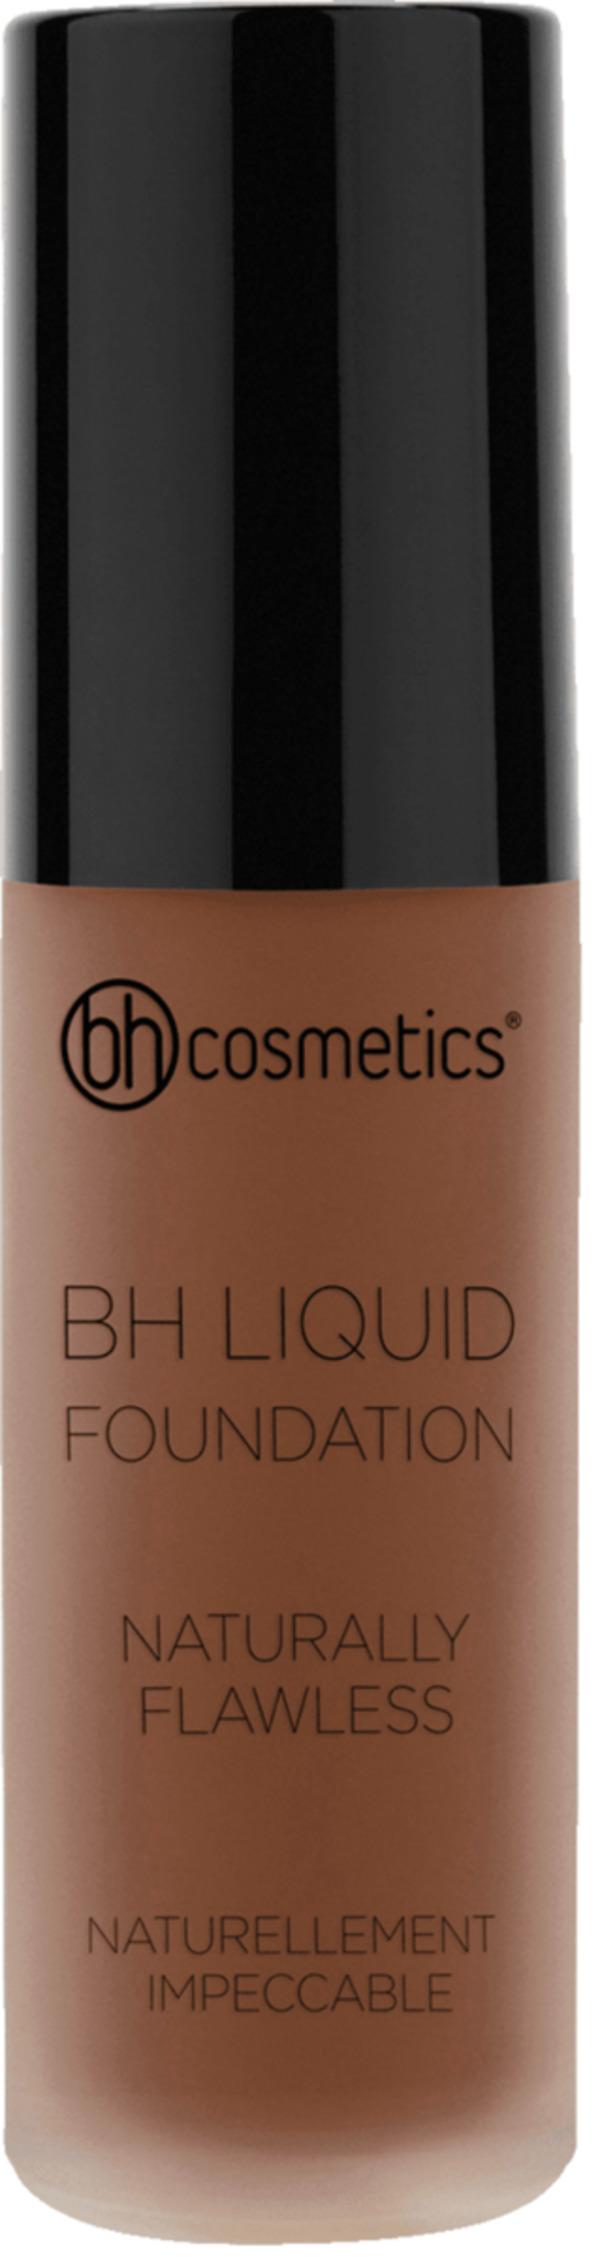 BH Cosmetics  Make-up Liquid Foundation Naturally Flawless Deep Cocoa 228